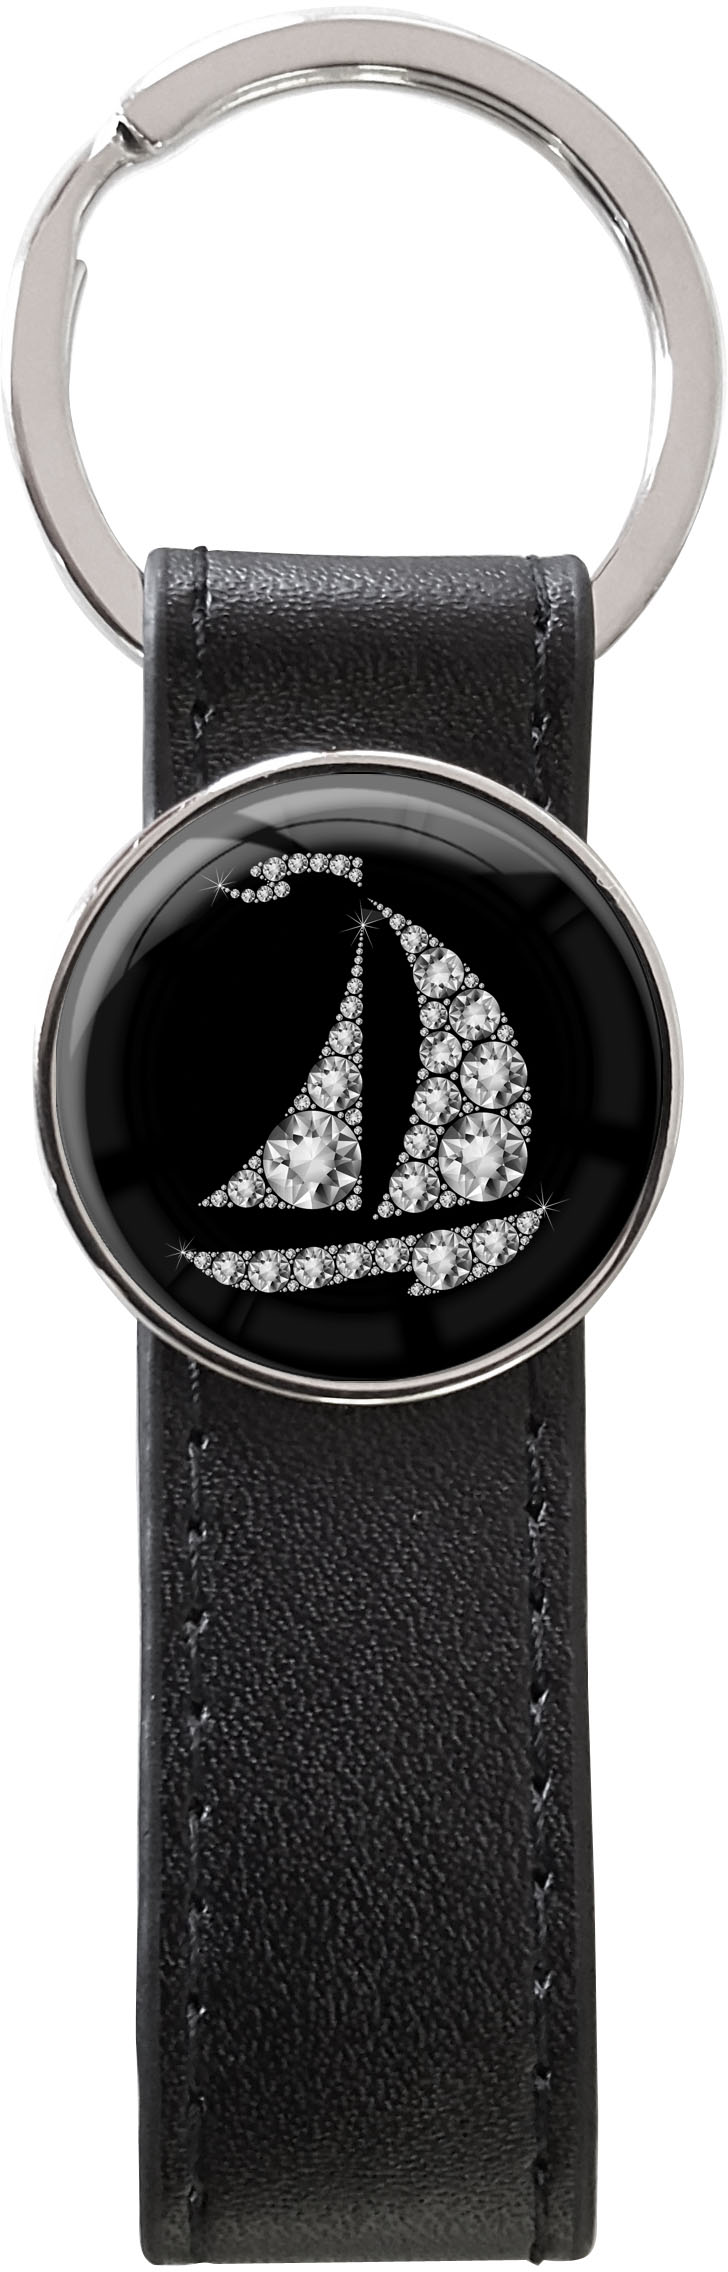 Schlüsselanhänger PU - Leder / Segelboot in Silber